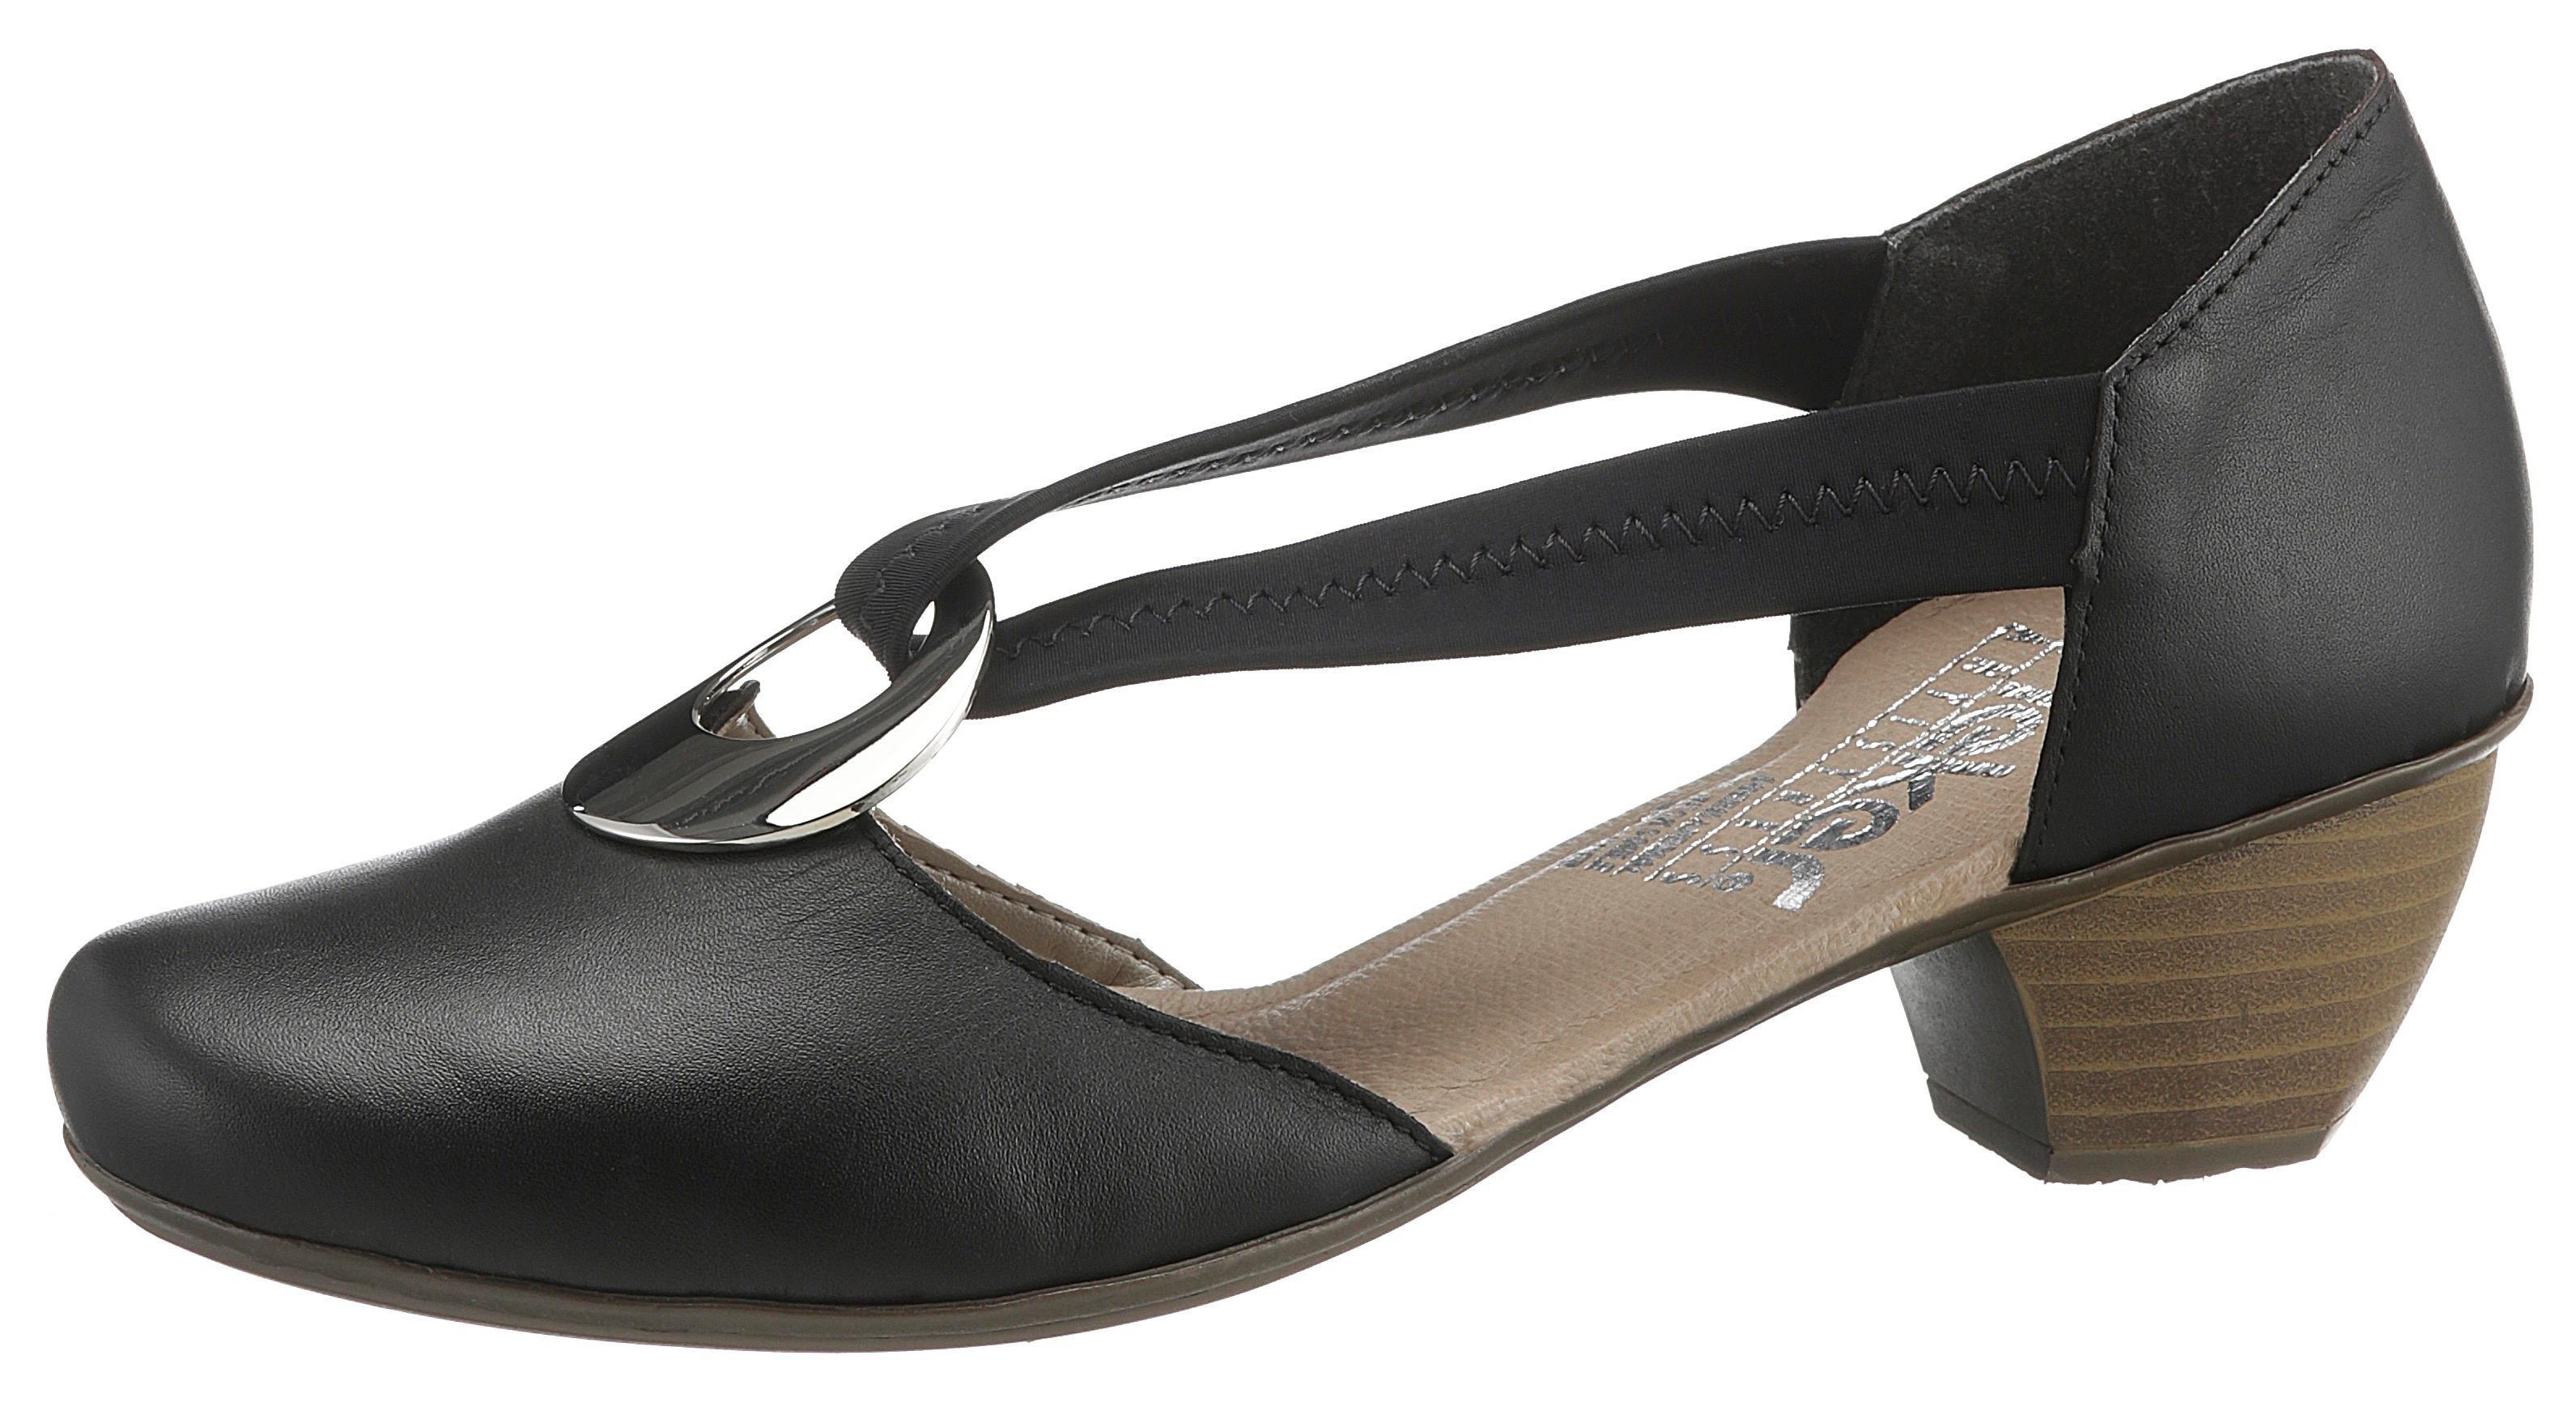 d29ace6dc83 ... RIEKER teenslippers, Rieker plateausneakers, RIEKER Trekking-sandalen  van leer, Rieker gesppumps